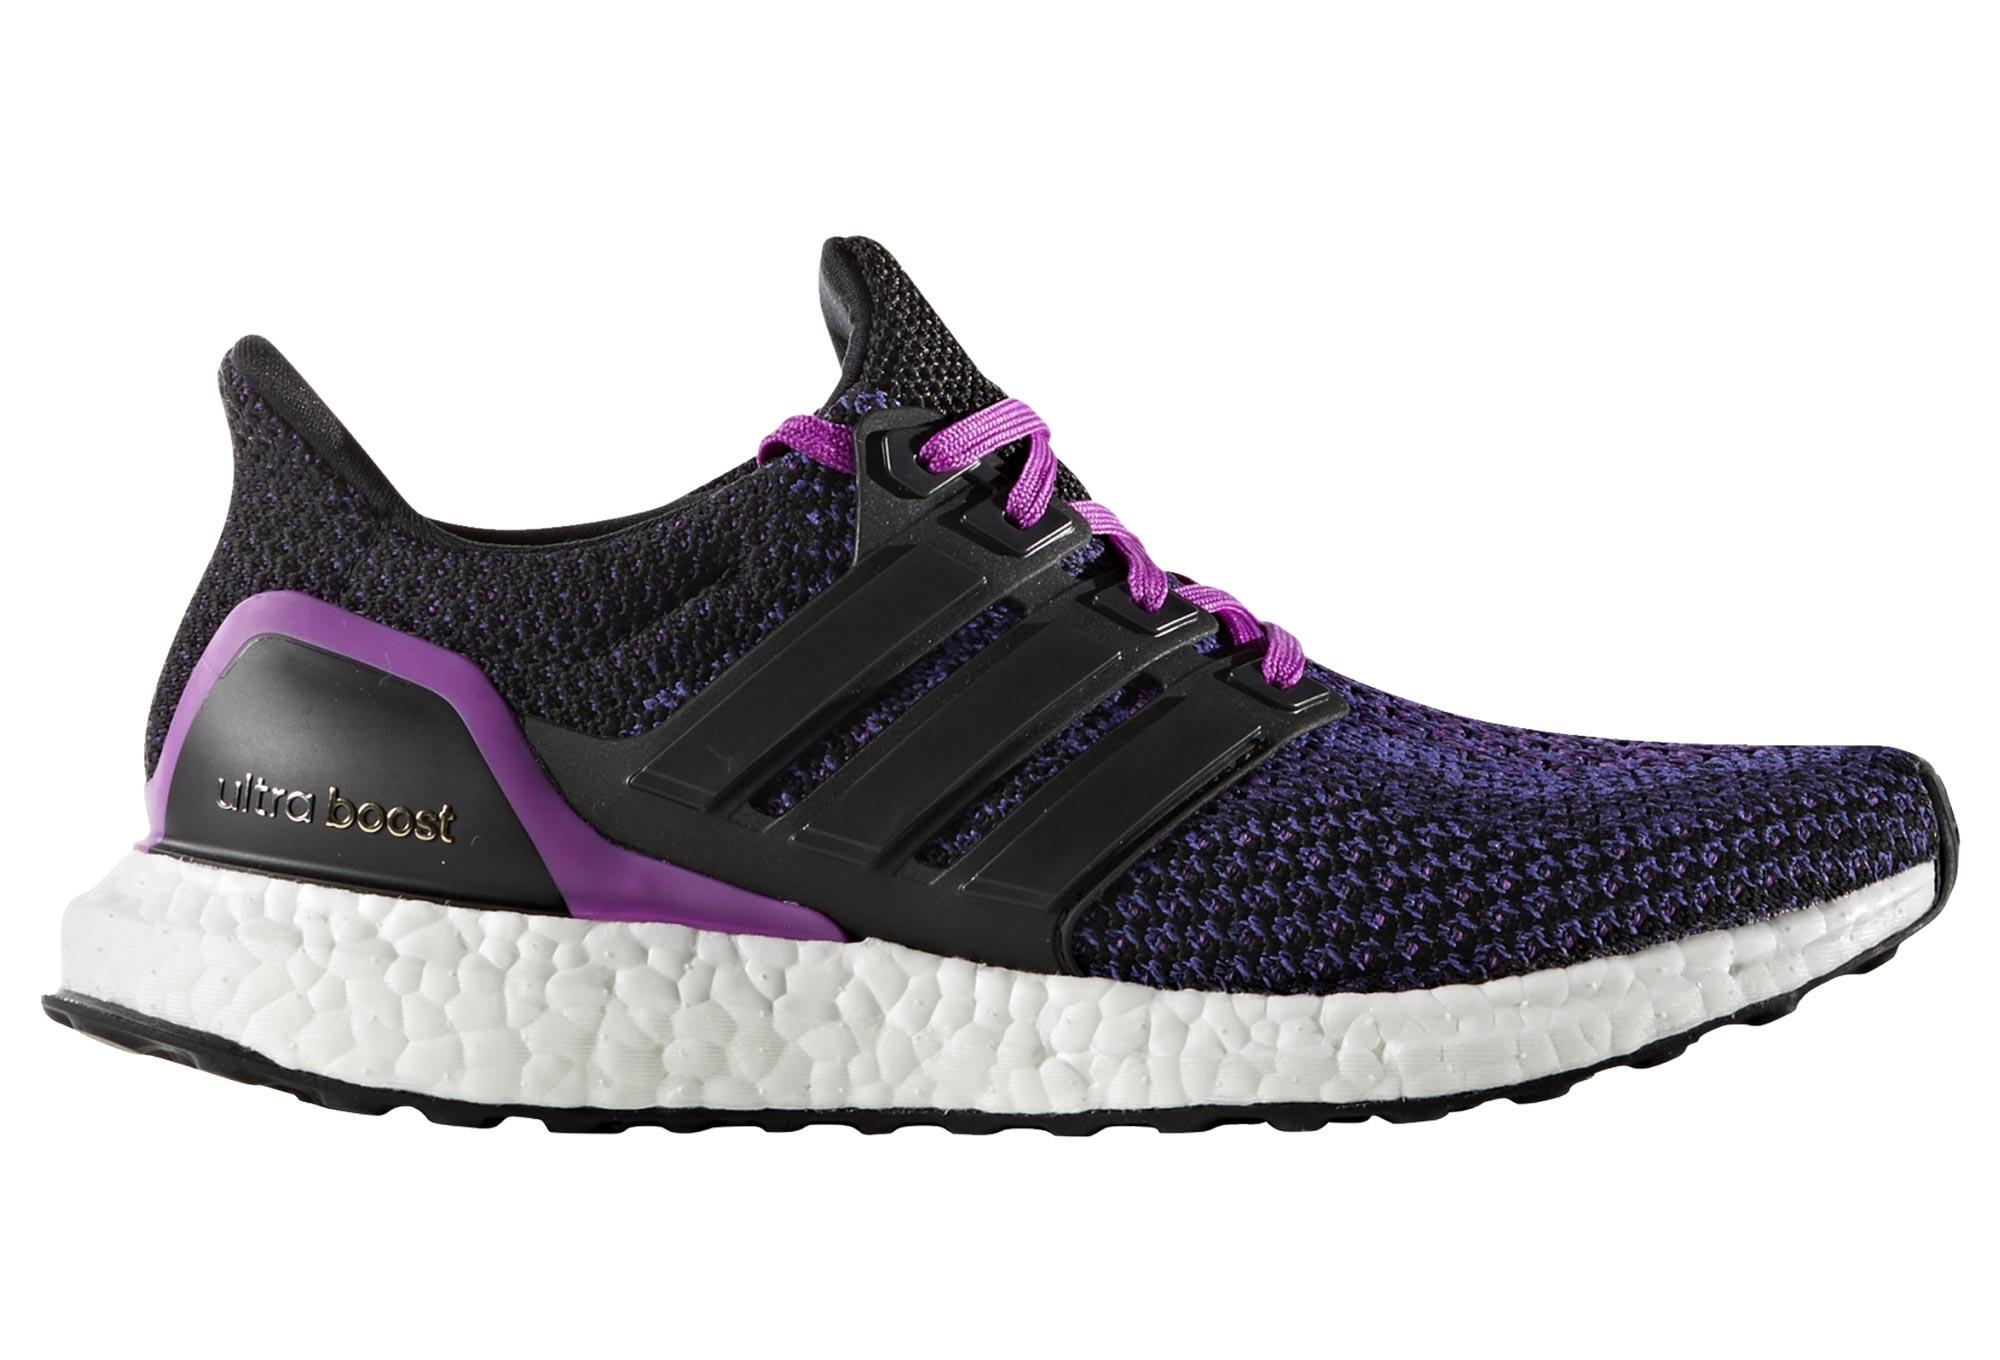 laufschuhe adidas ultra boost frauen violett schwarz. Black Bedroom Furniture Sets. Home Design Ideas